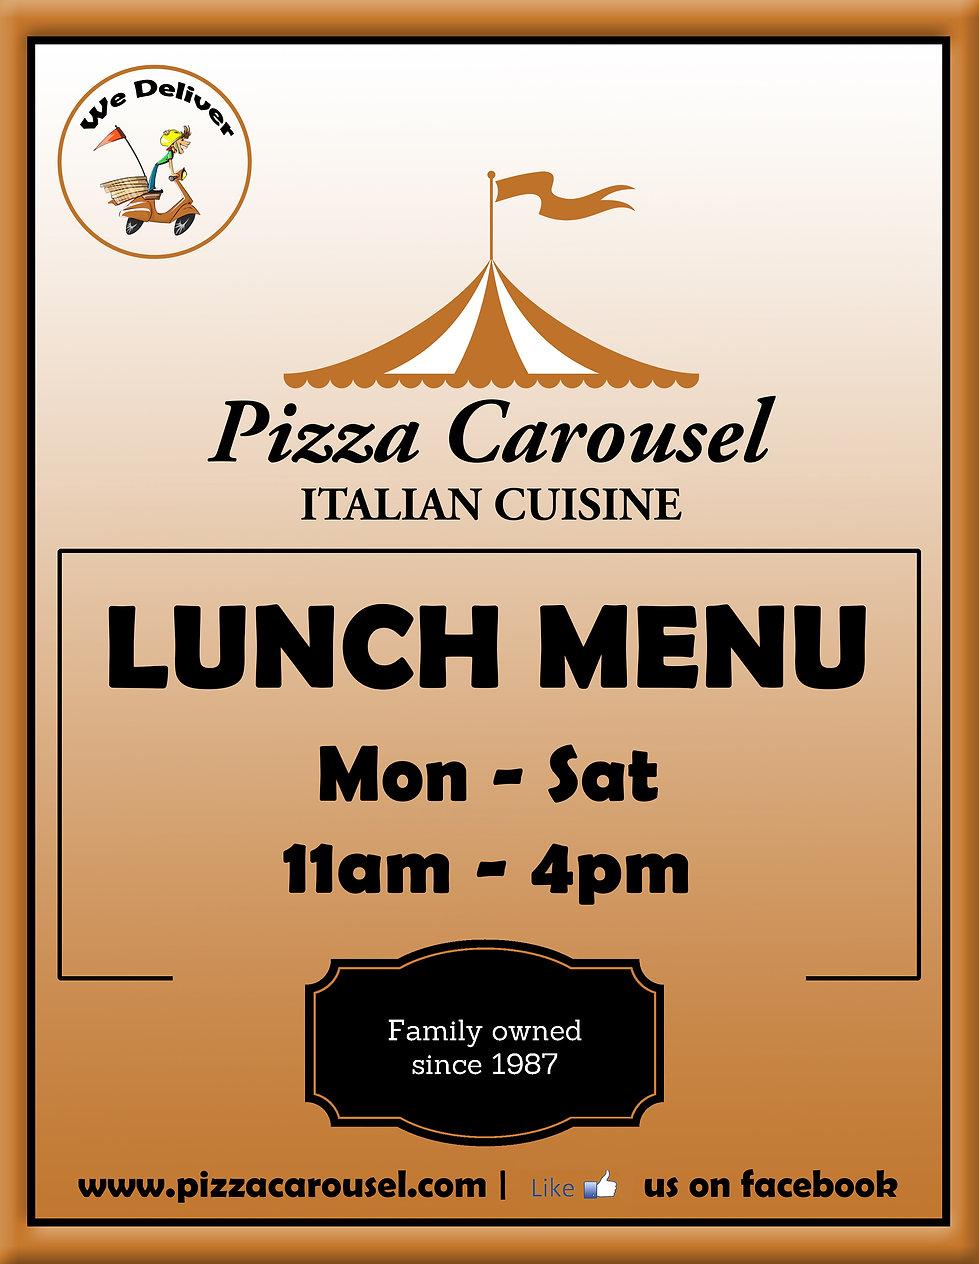 Pizza Carousel